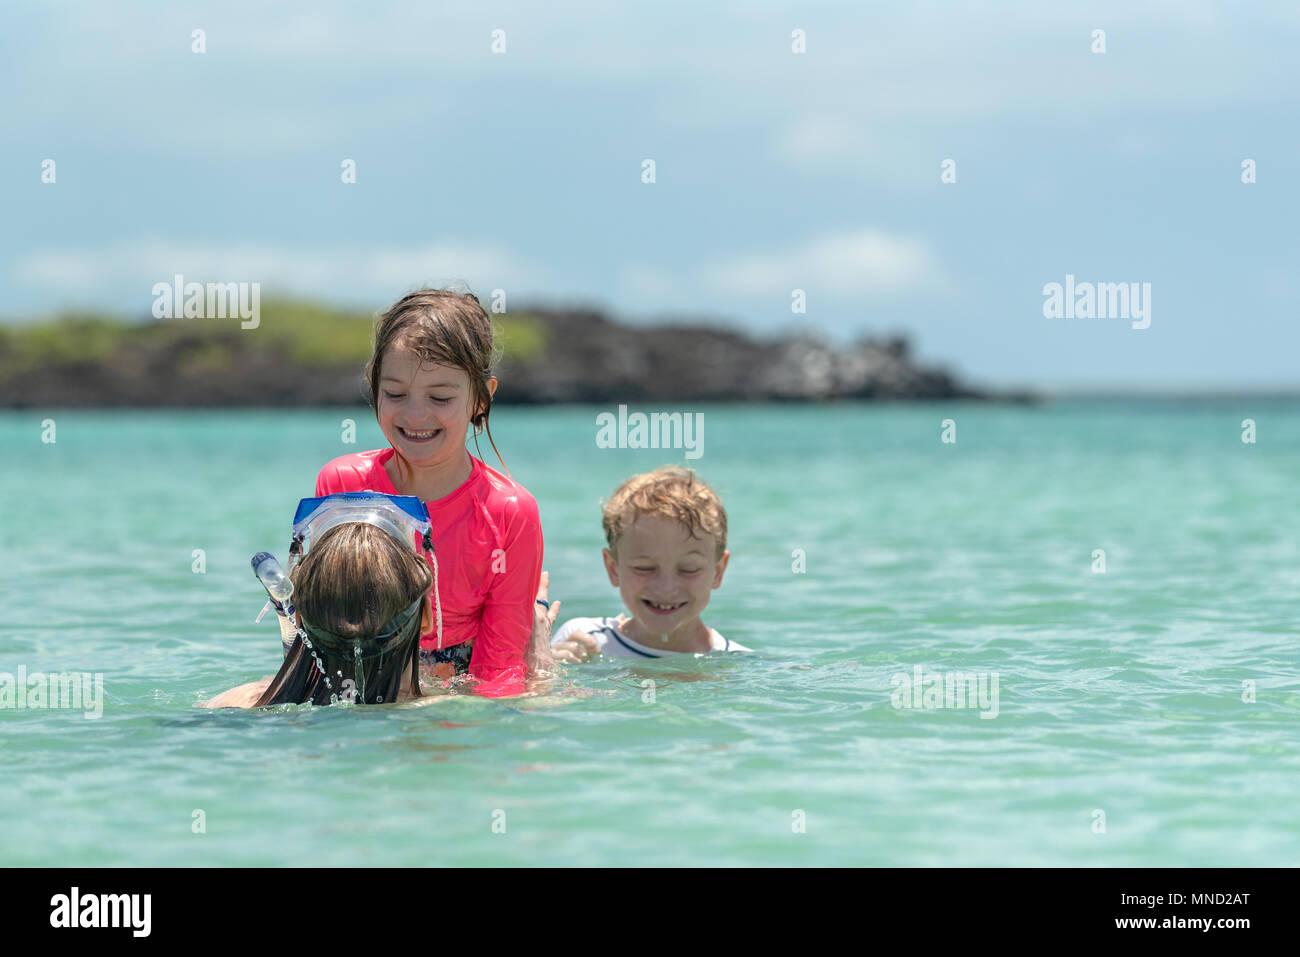 f4f9f9b46b7 Mother and children enjoying the water off San Cristobal Island, Galapagos  Islands, Ecuador.